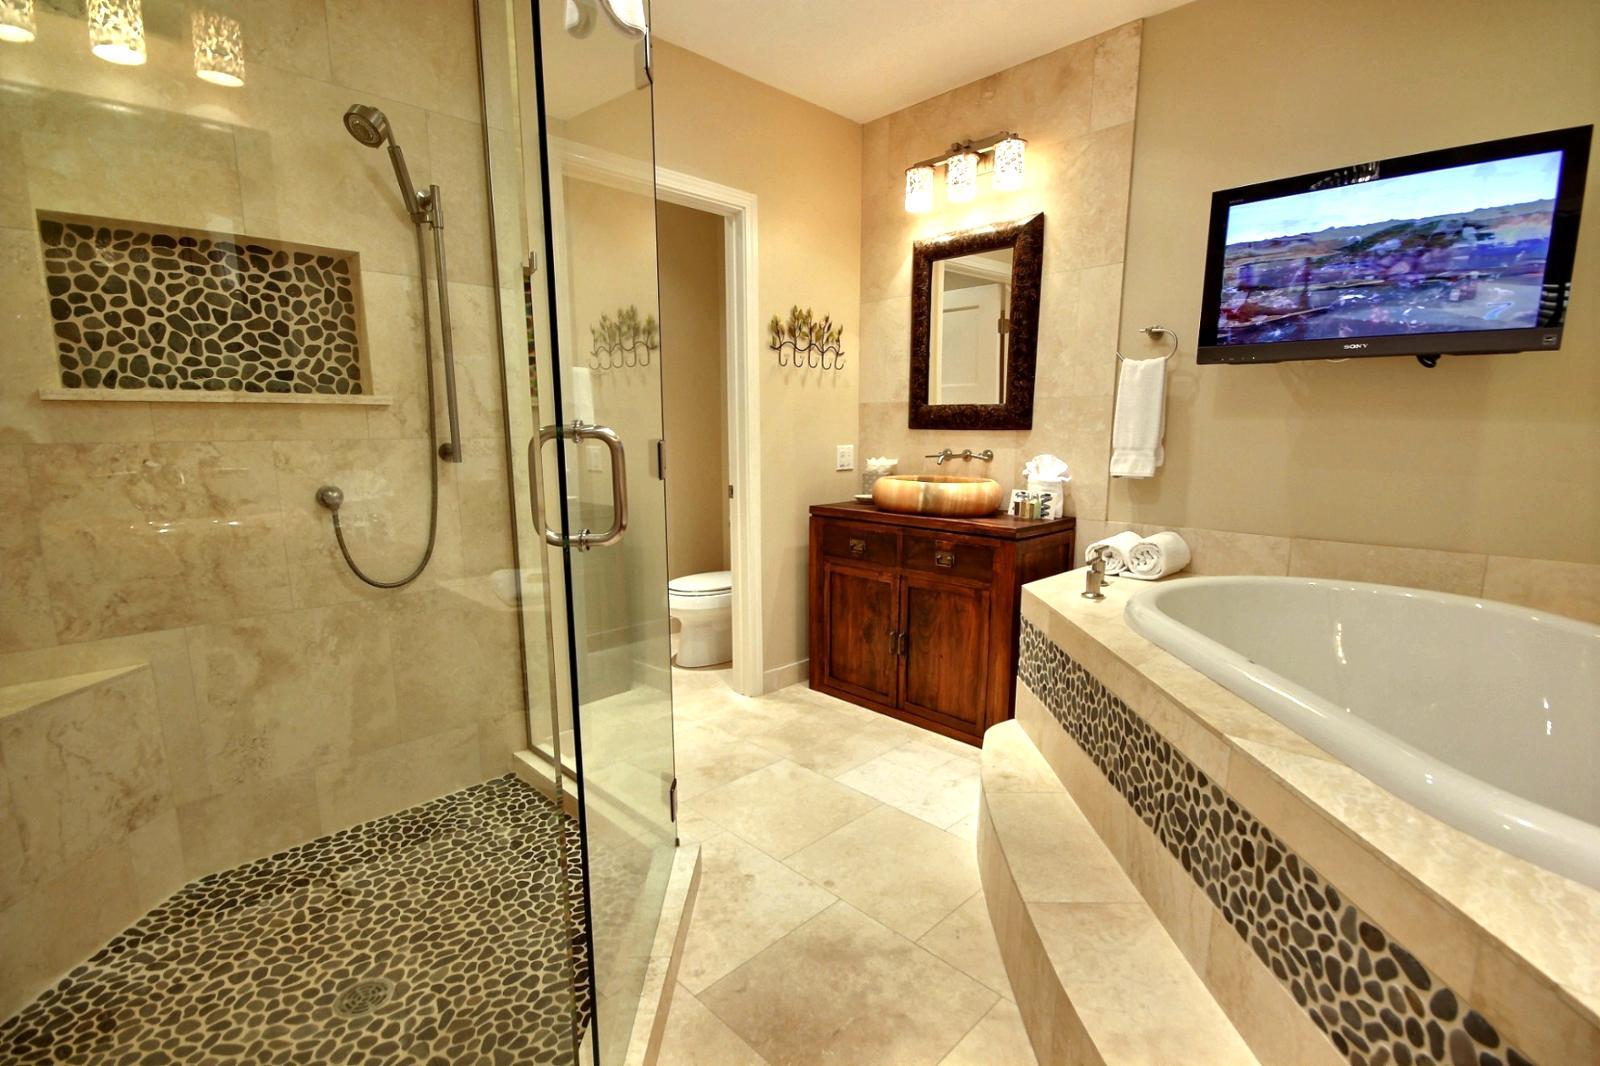 Телевизор на кронштейнах в ванной комнате